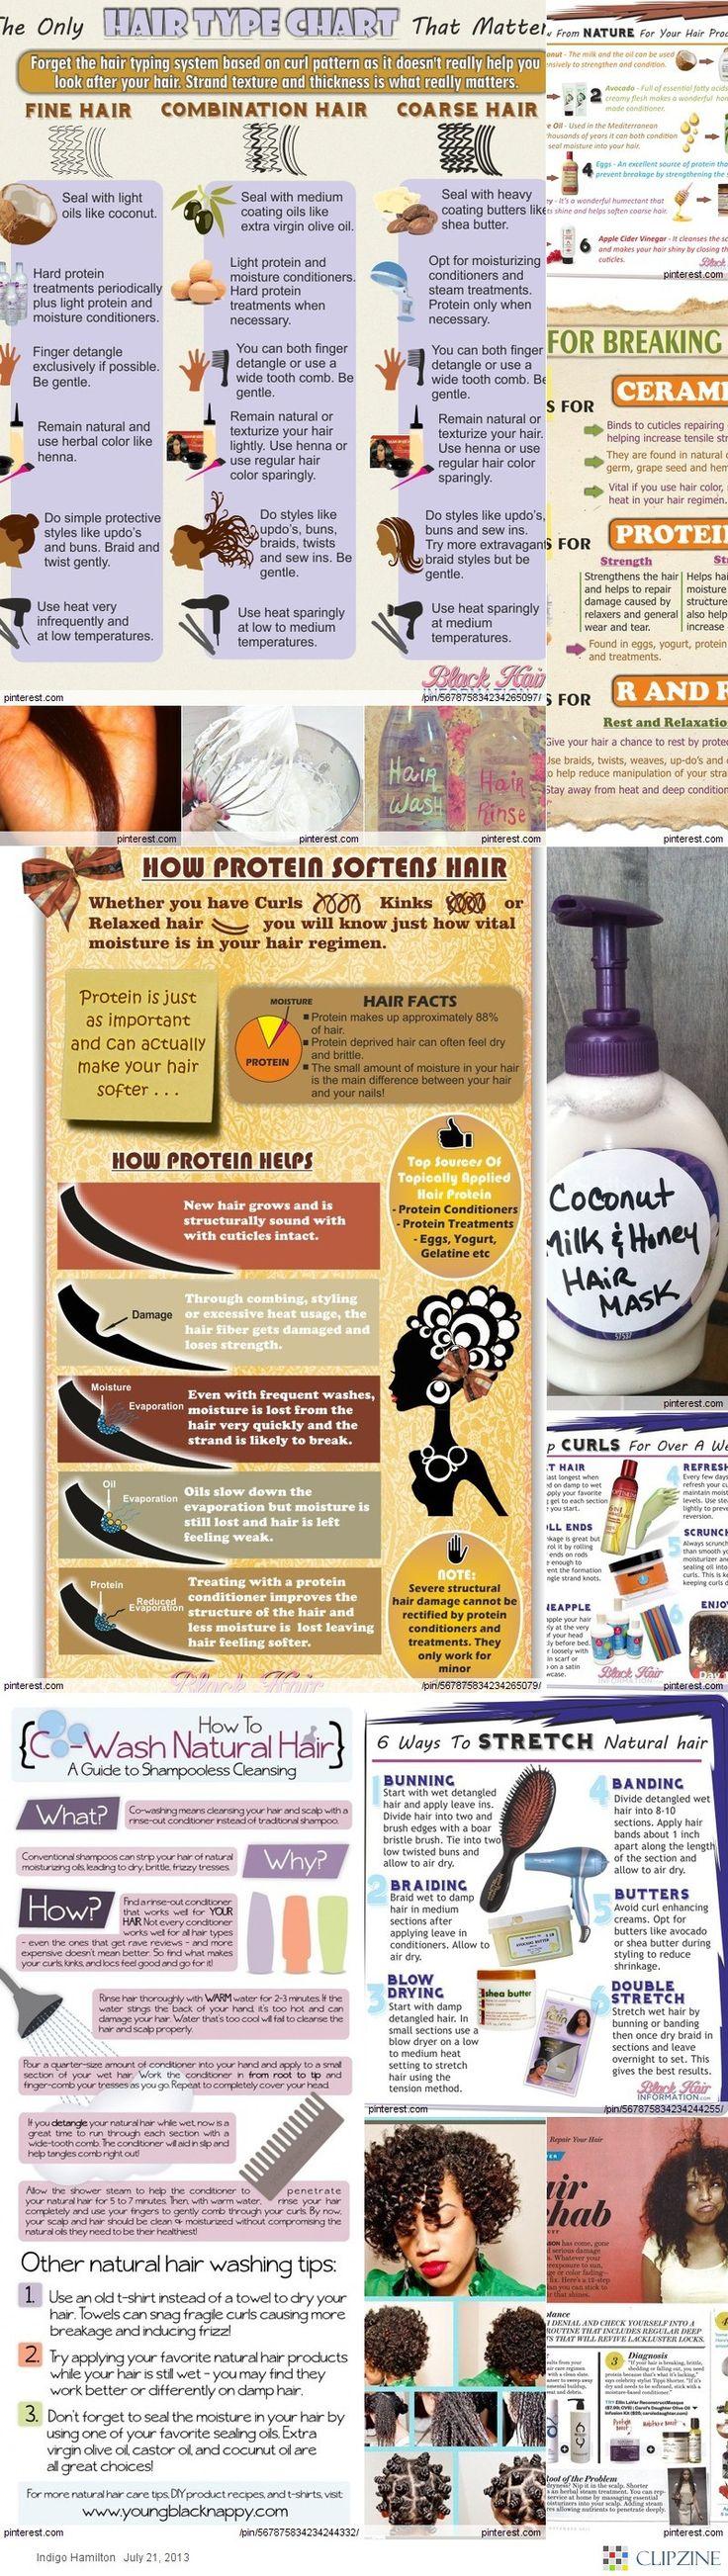 Natural hair care